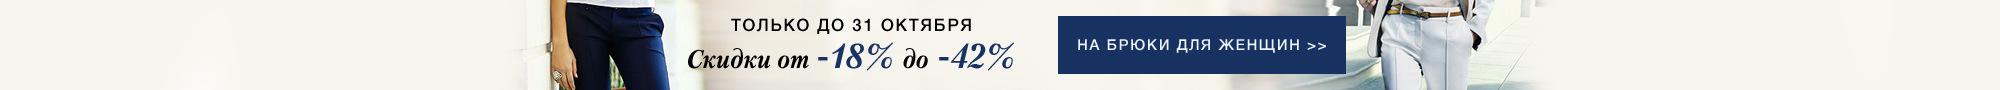 Скидки от -18% до -42% на Брюки для женщин